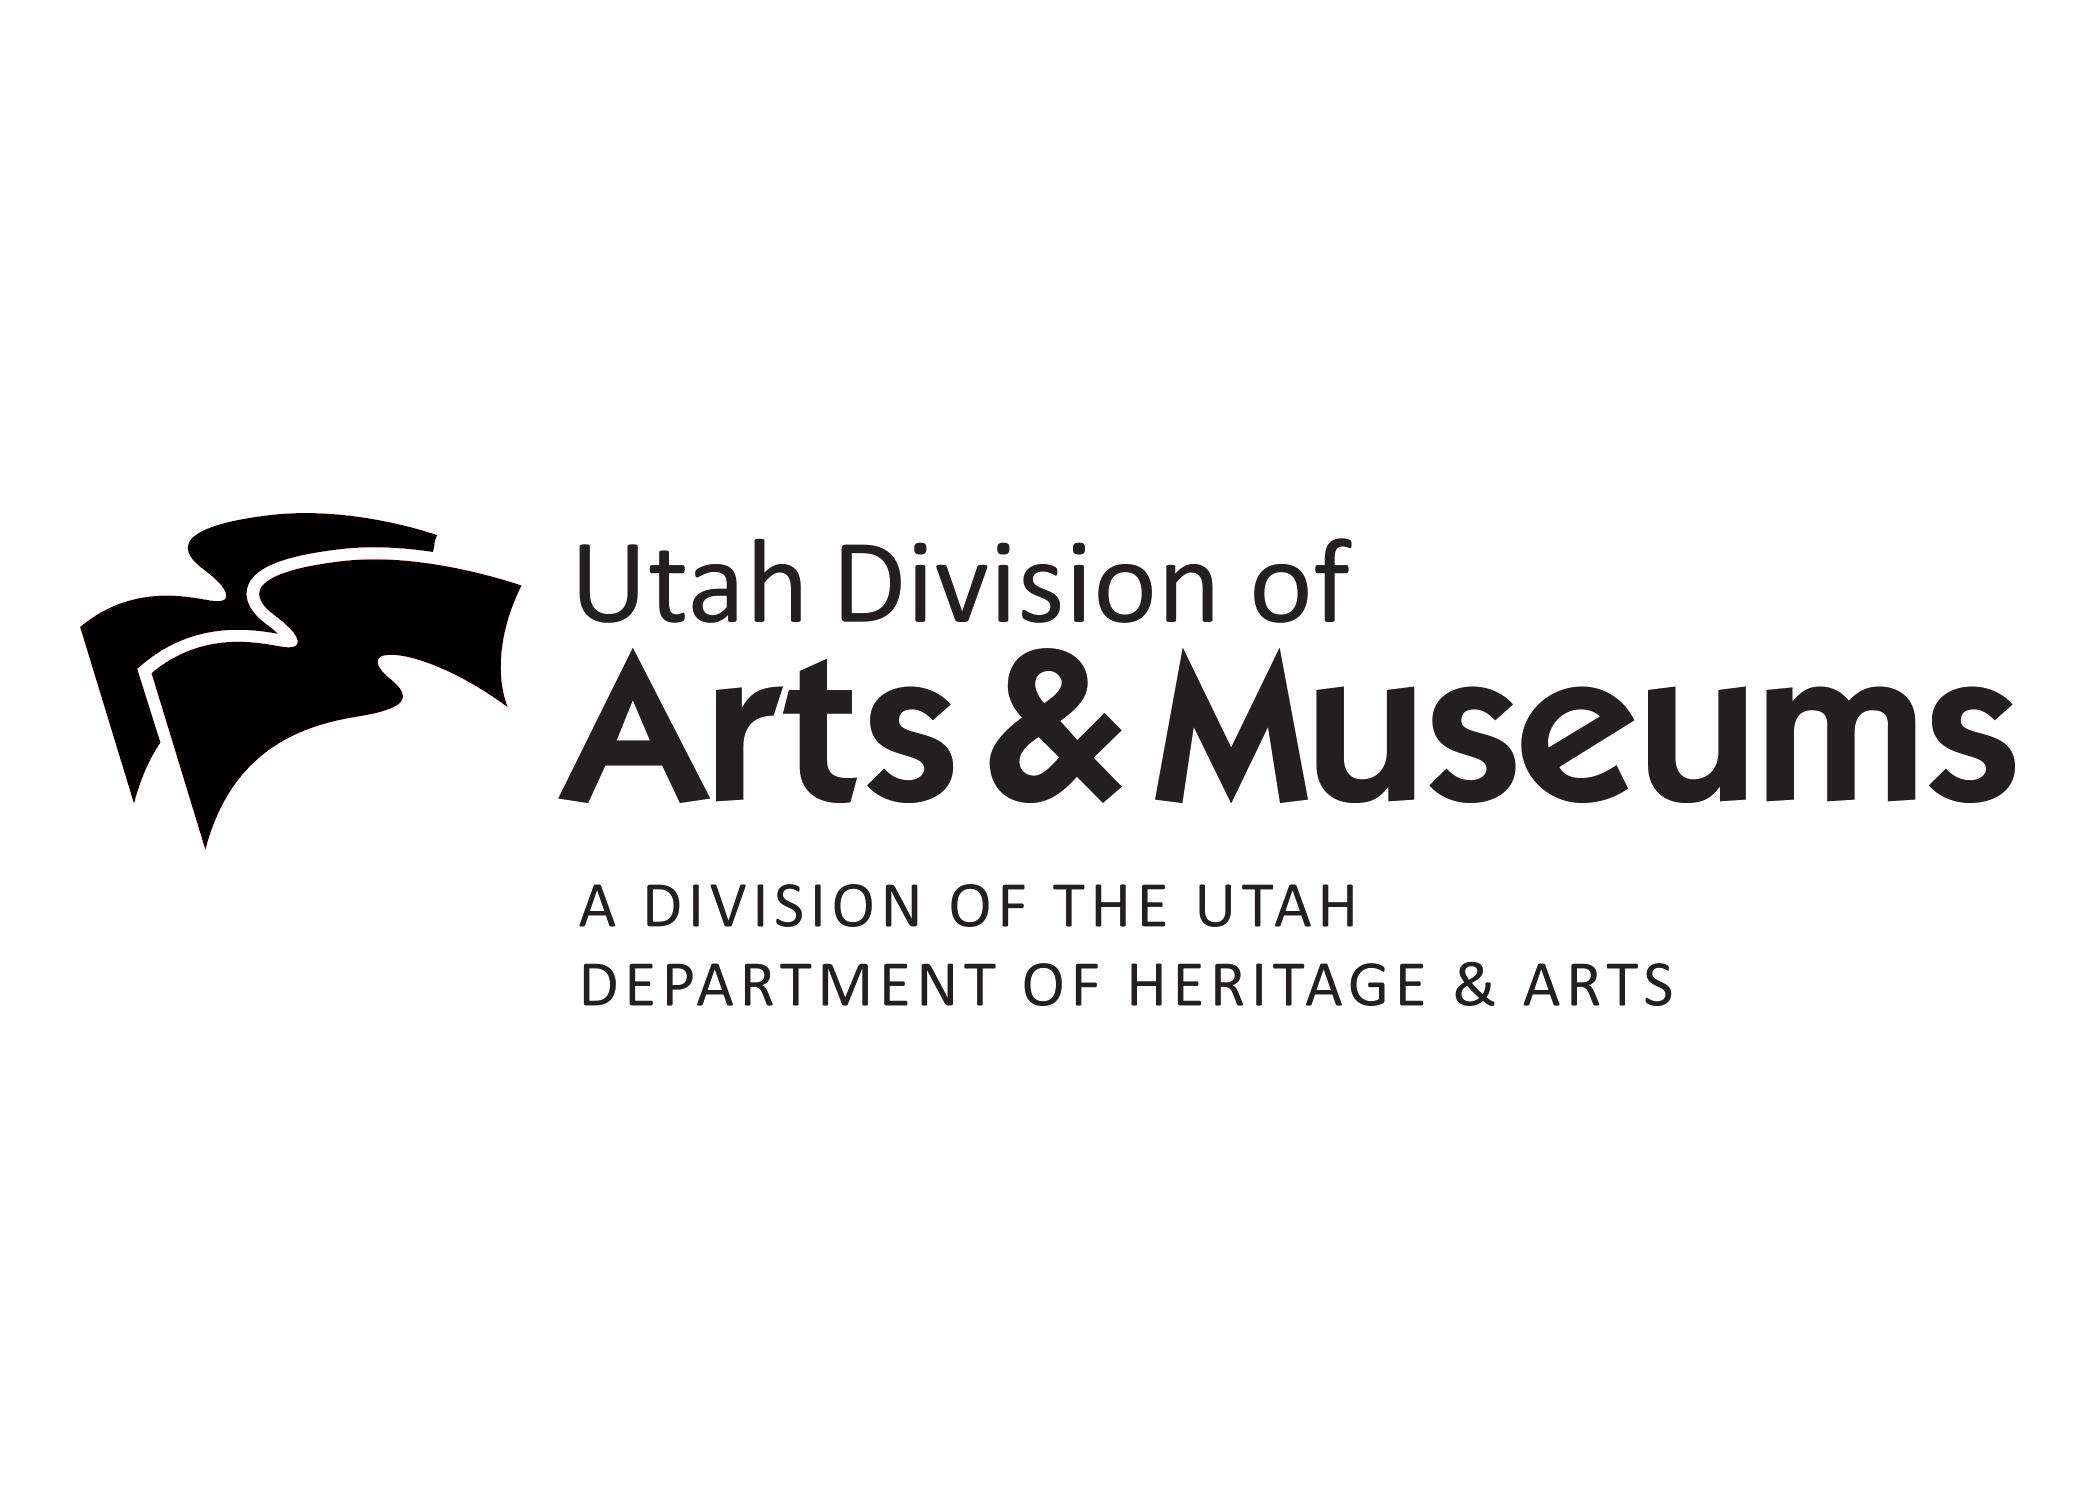 Utah-Arts-Museums_small.jpg